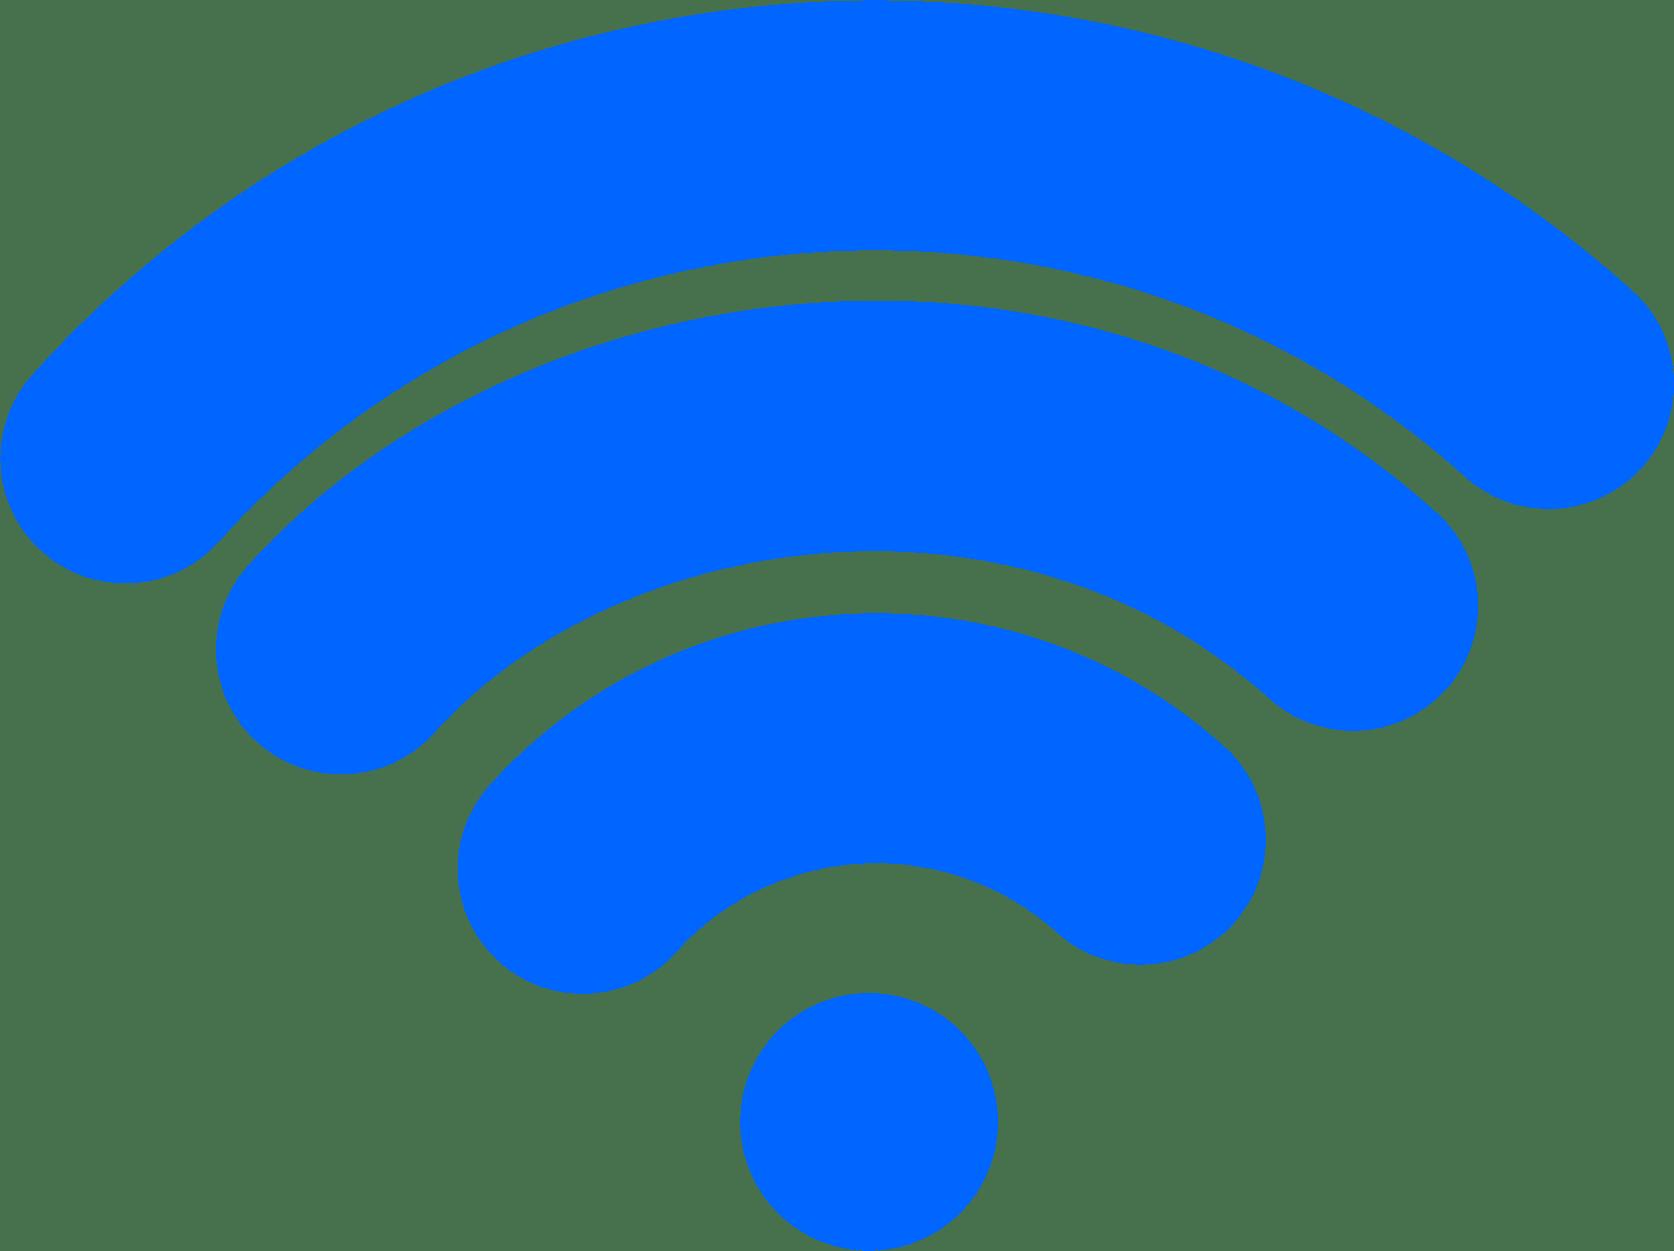 Free wifi station clipart banner royalty free download Free WiFi at 8 More Suburban Mumbai Railway Stations banner royalty free download